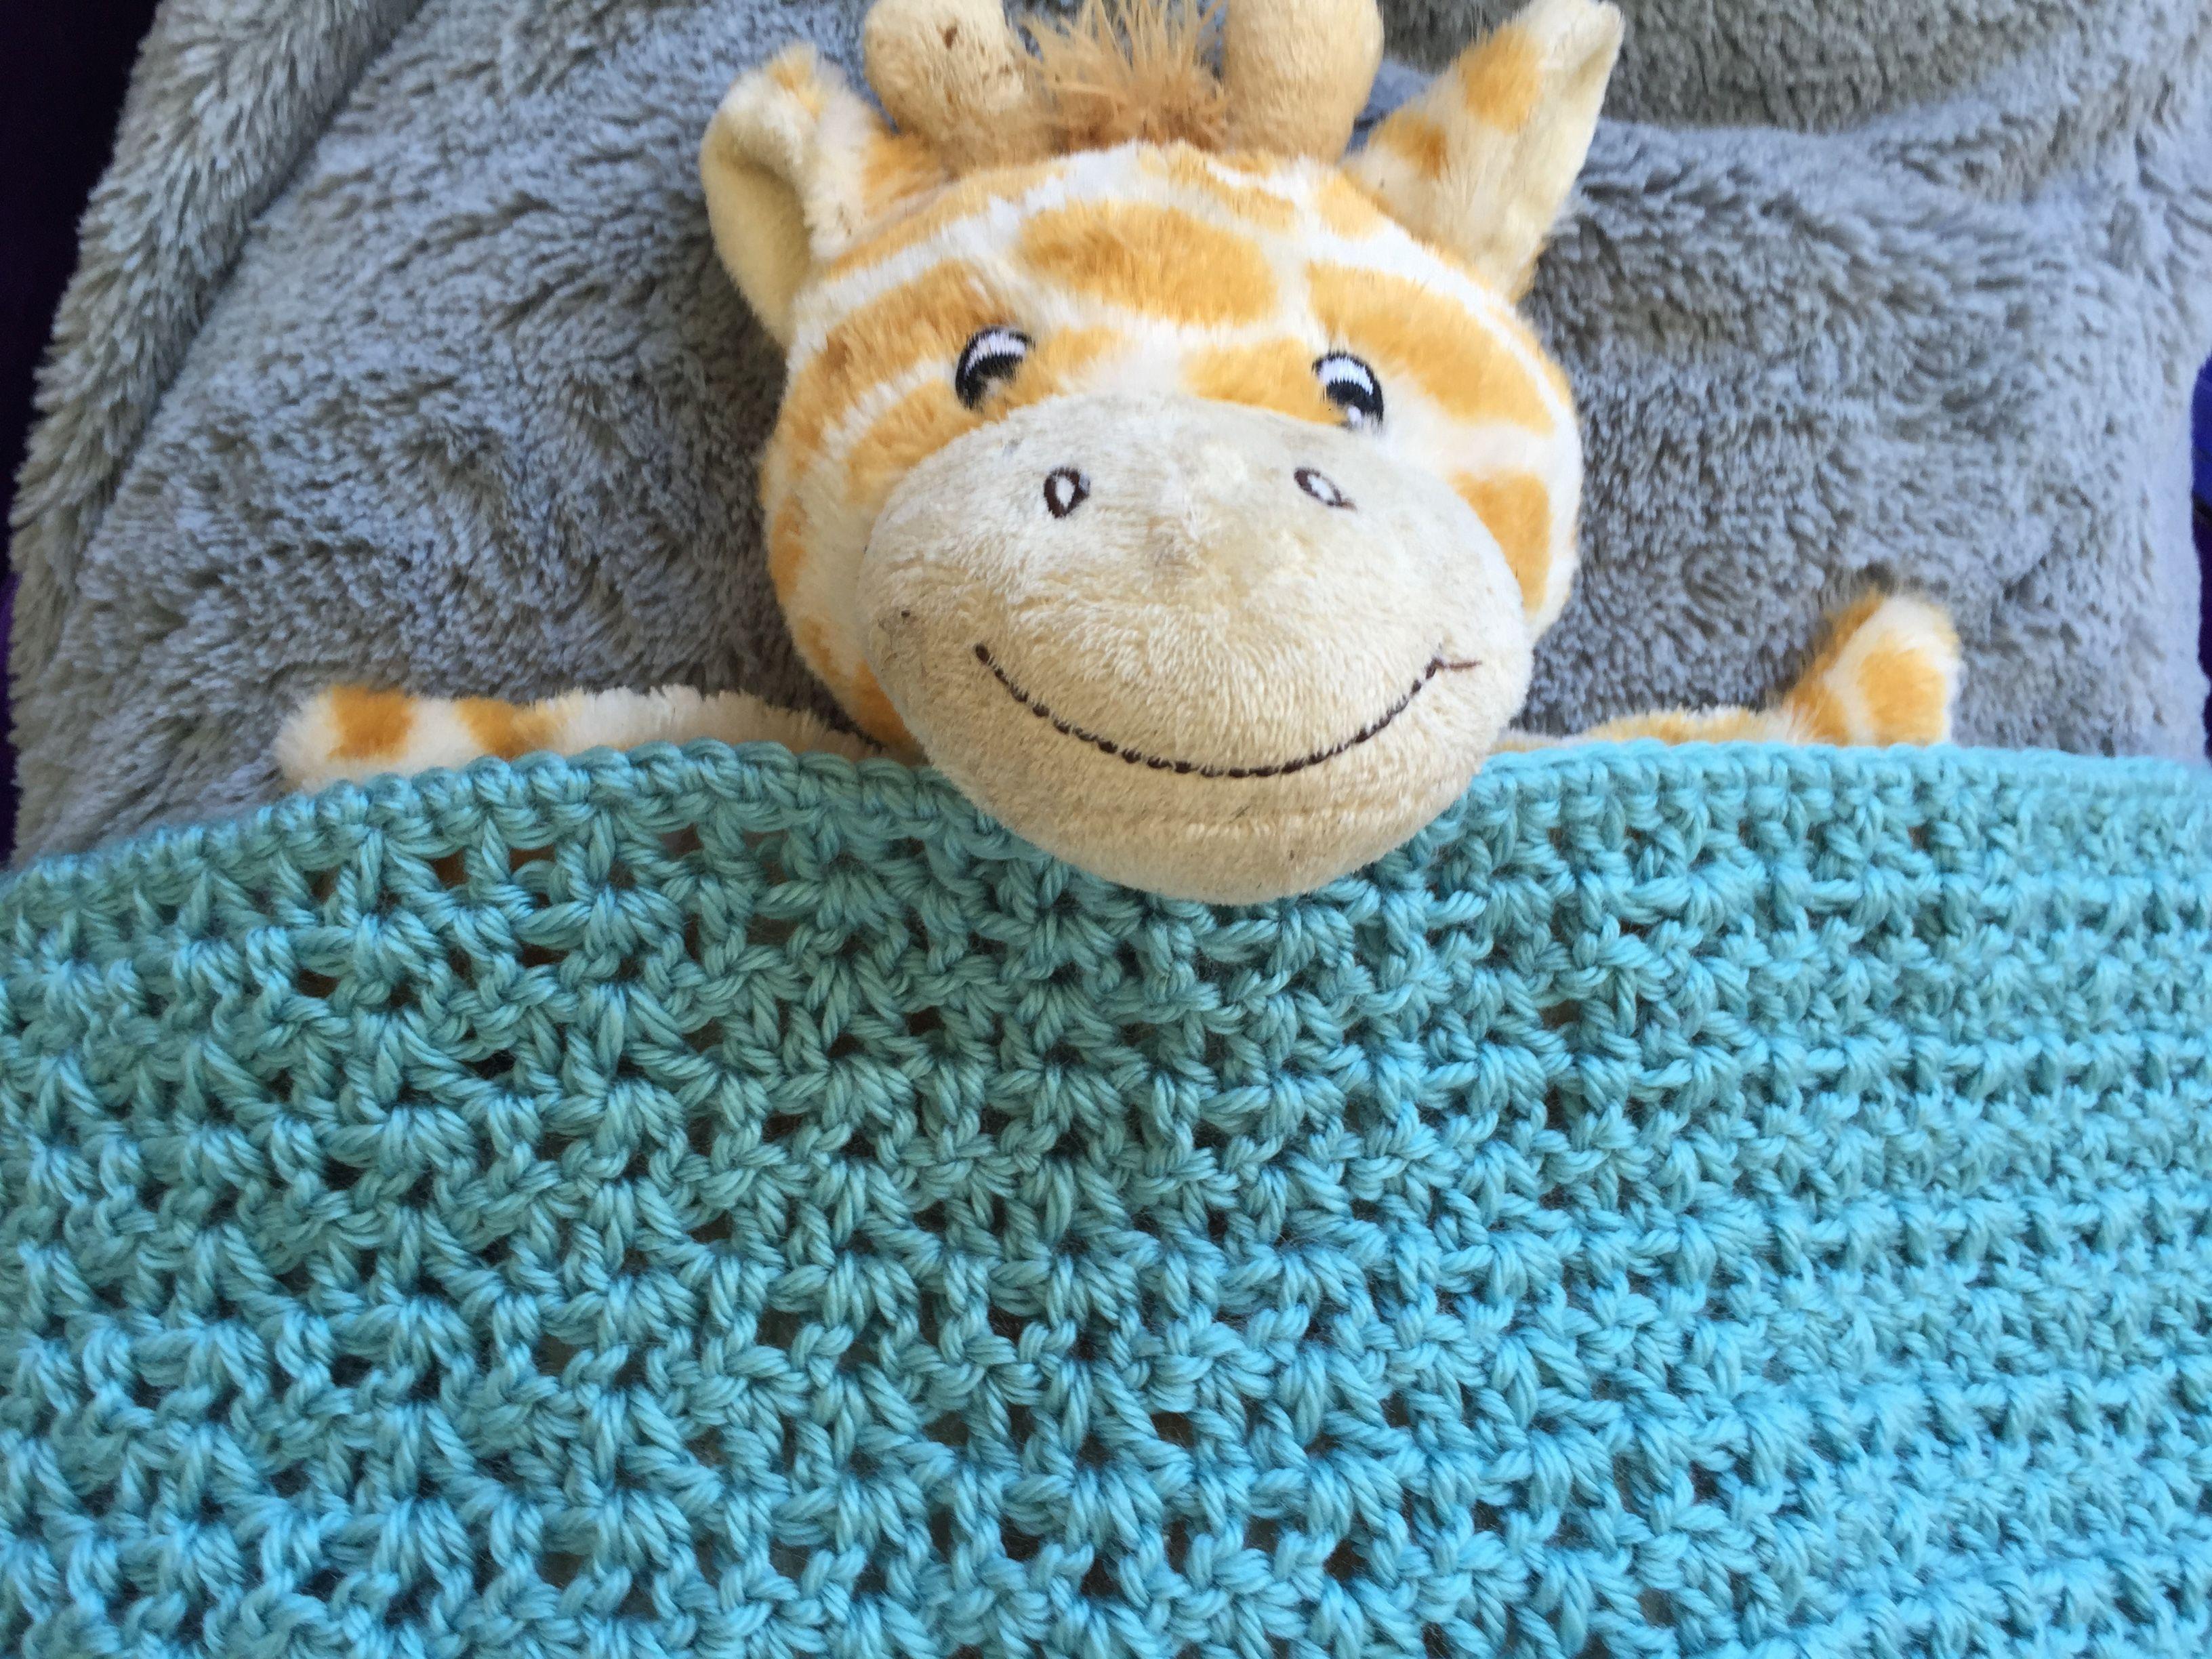 40 Crochet Doll Patterns (Clothing & Accessories) | AllFreeCrochet.com | 2448x3264